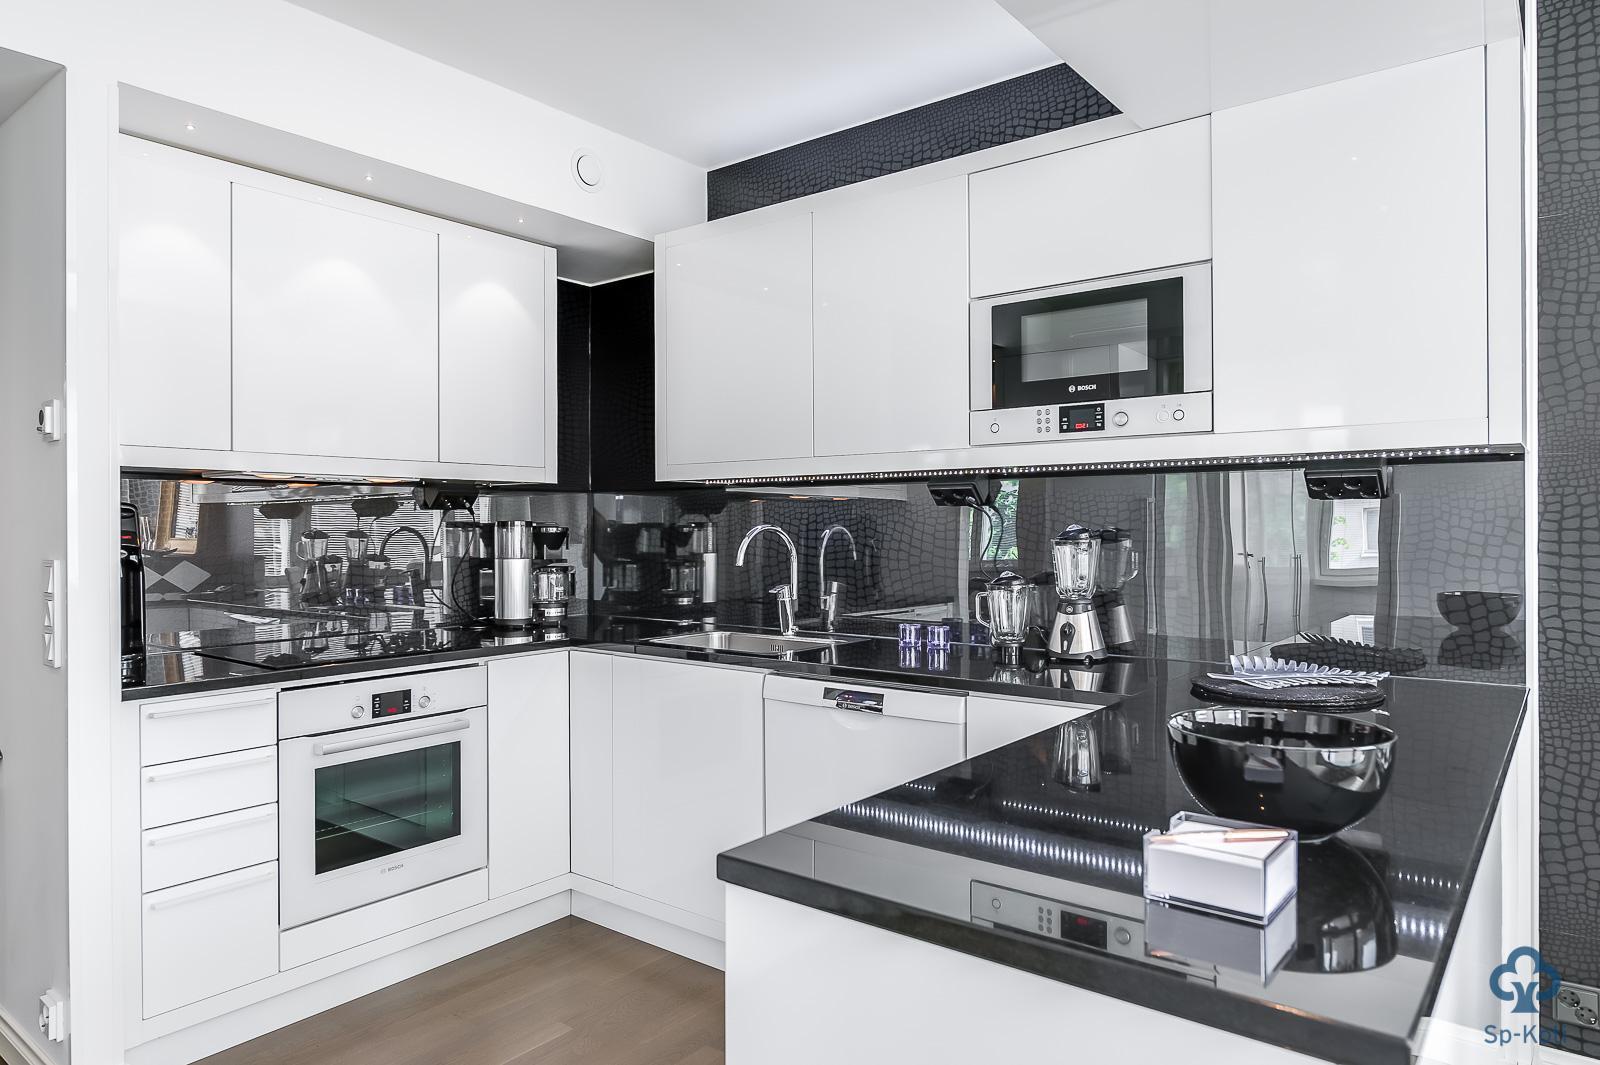 Moderni keittiö 9615069  Etuovi com Ideat & vinkit